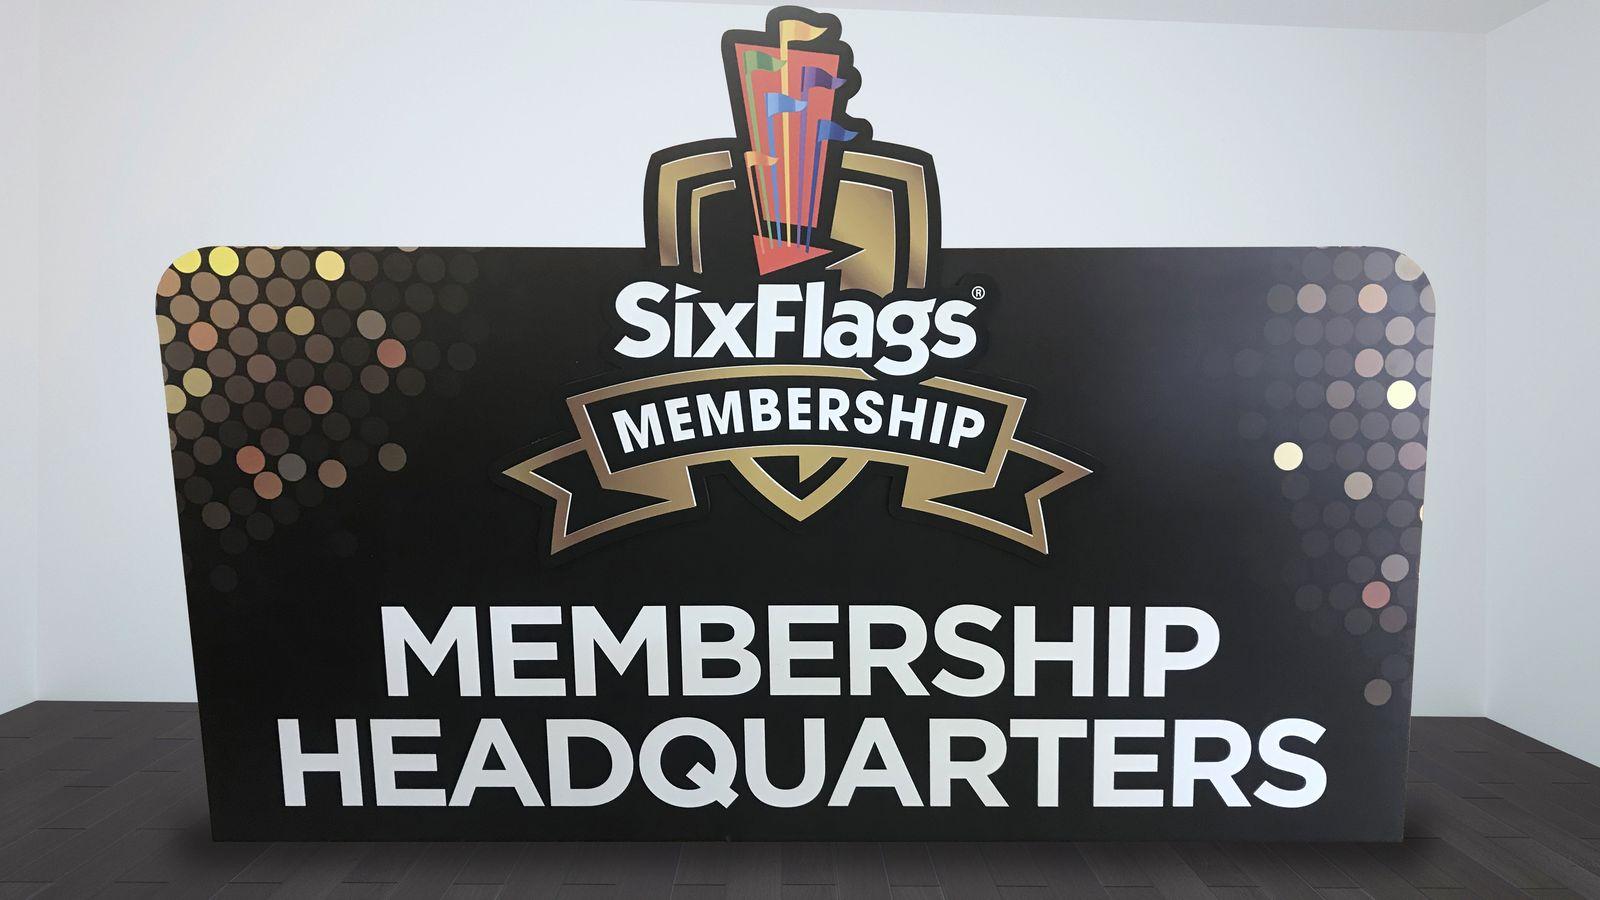 PVC stand sign for Six Flags amusement park